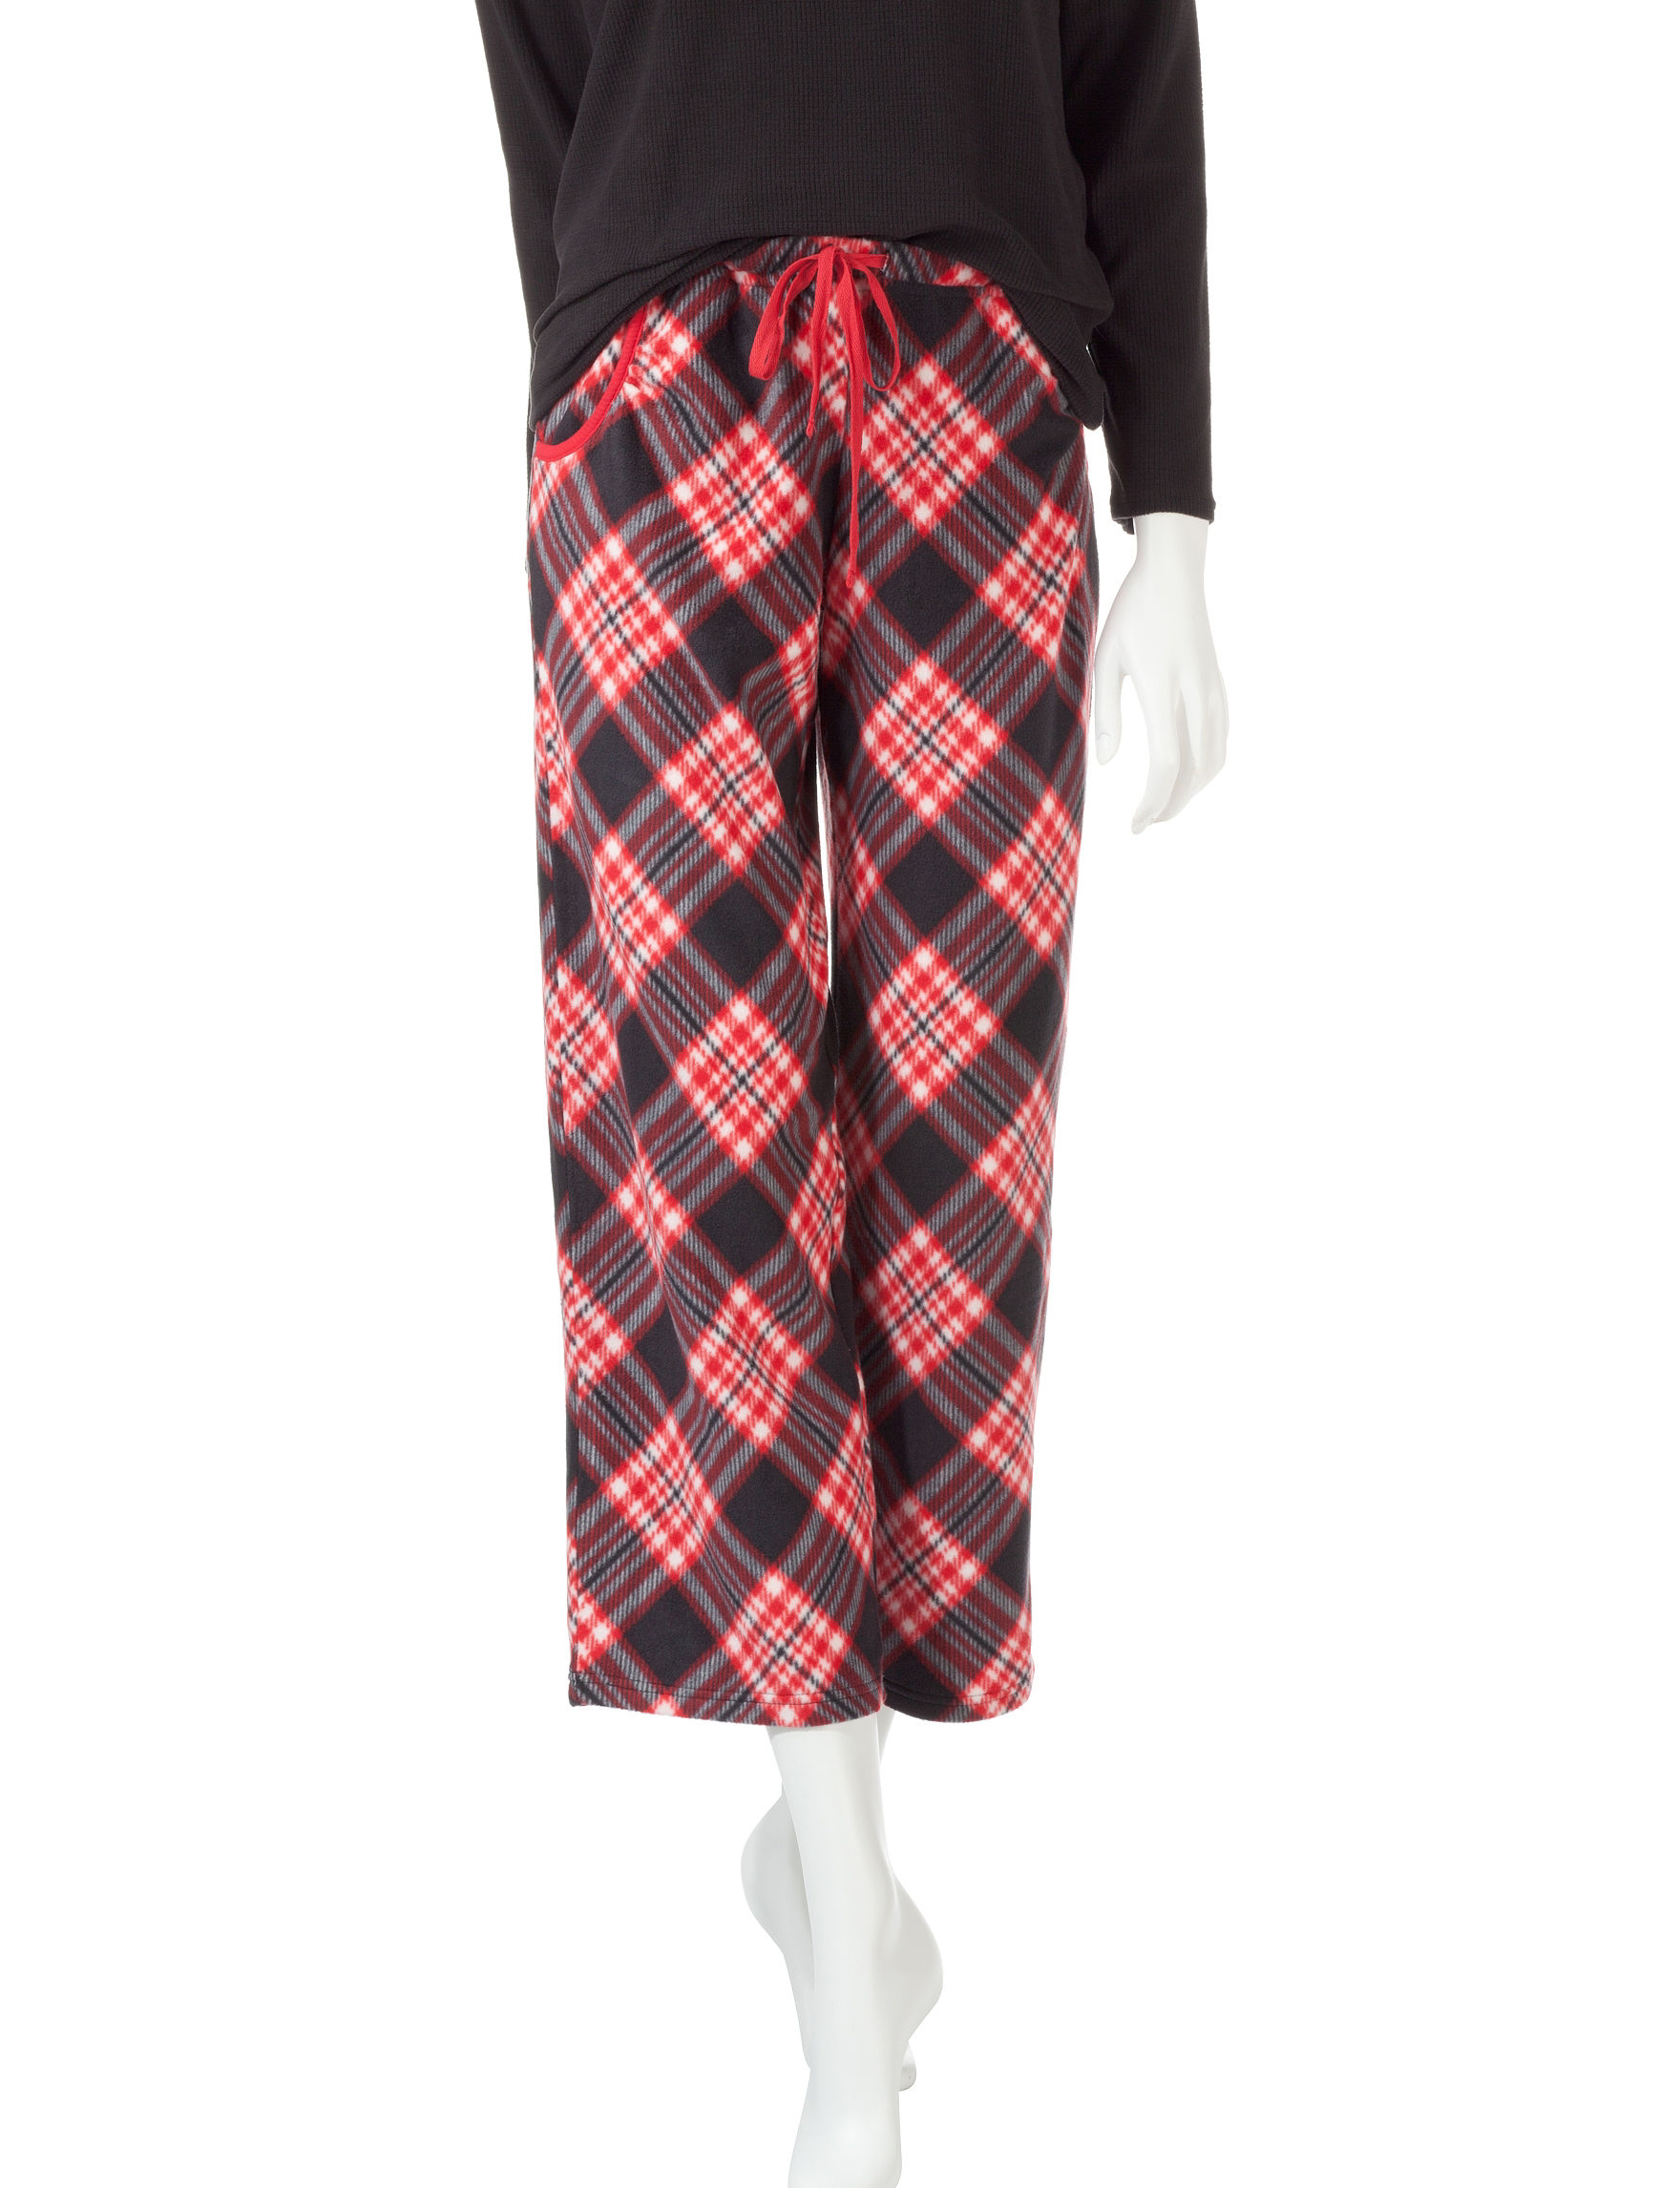 Goodnight Kiss Red / Black Pajama Bottoms